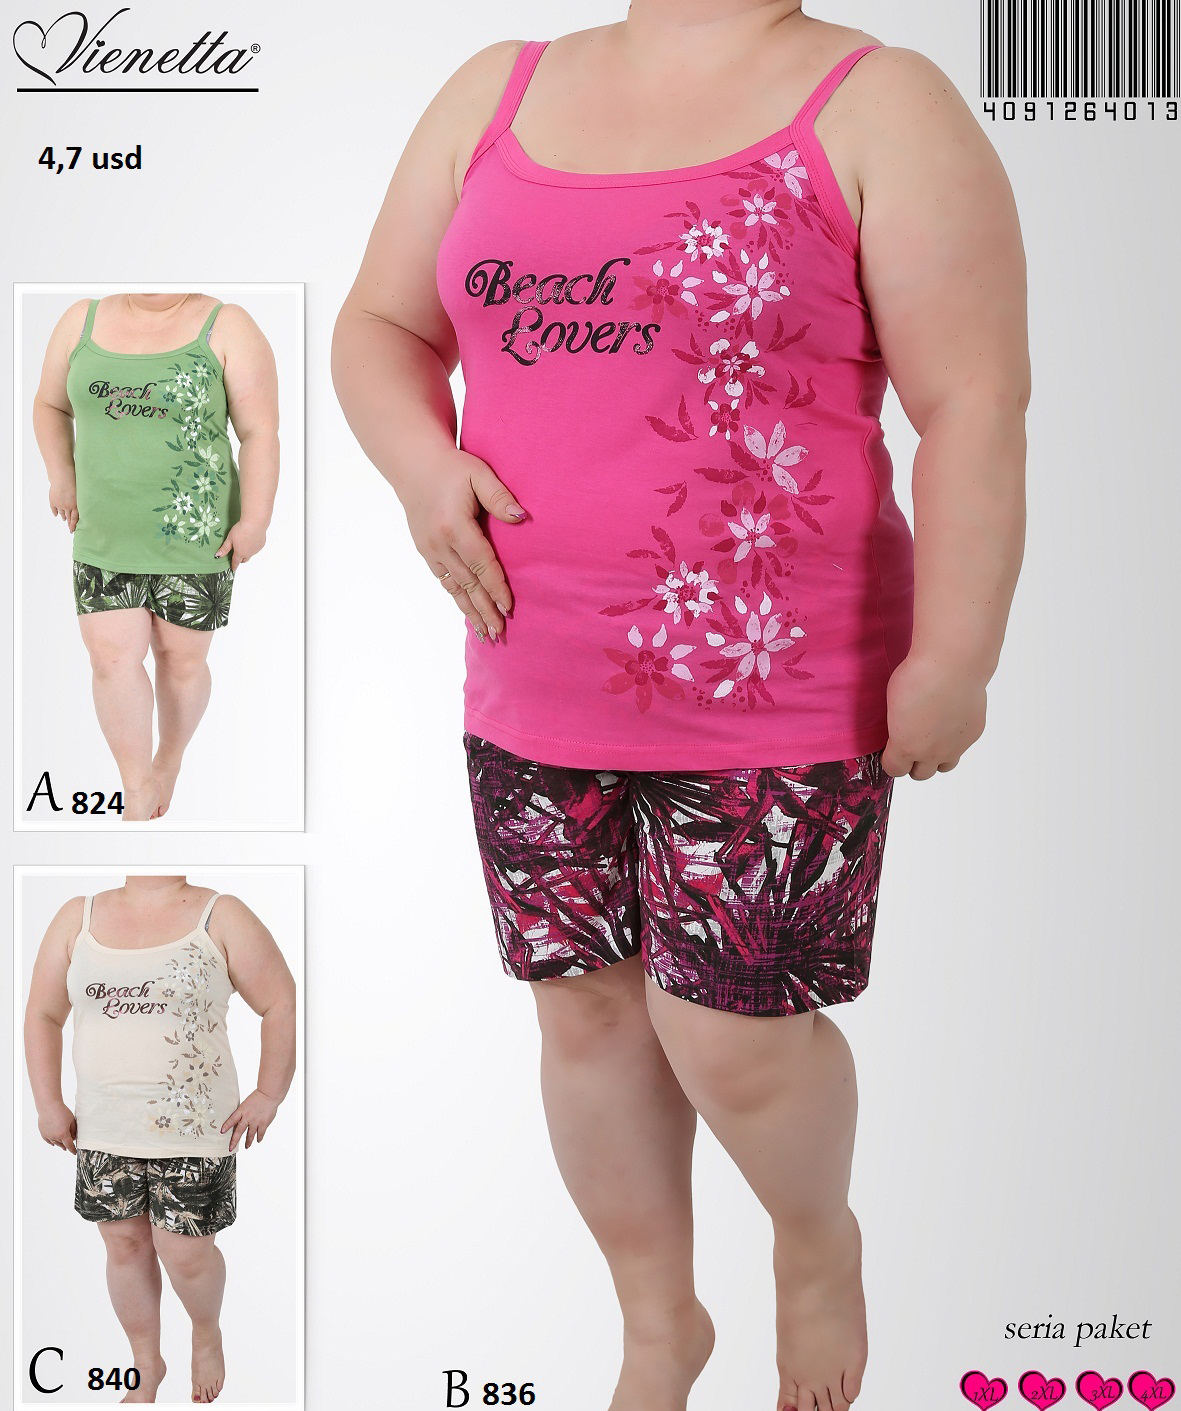 Пижама женская Шорты 4091264013